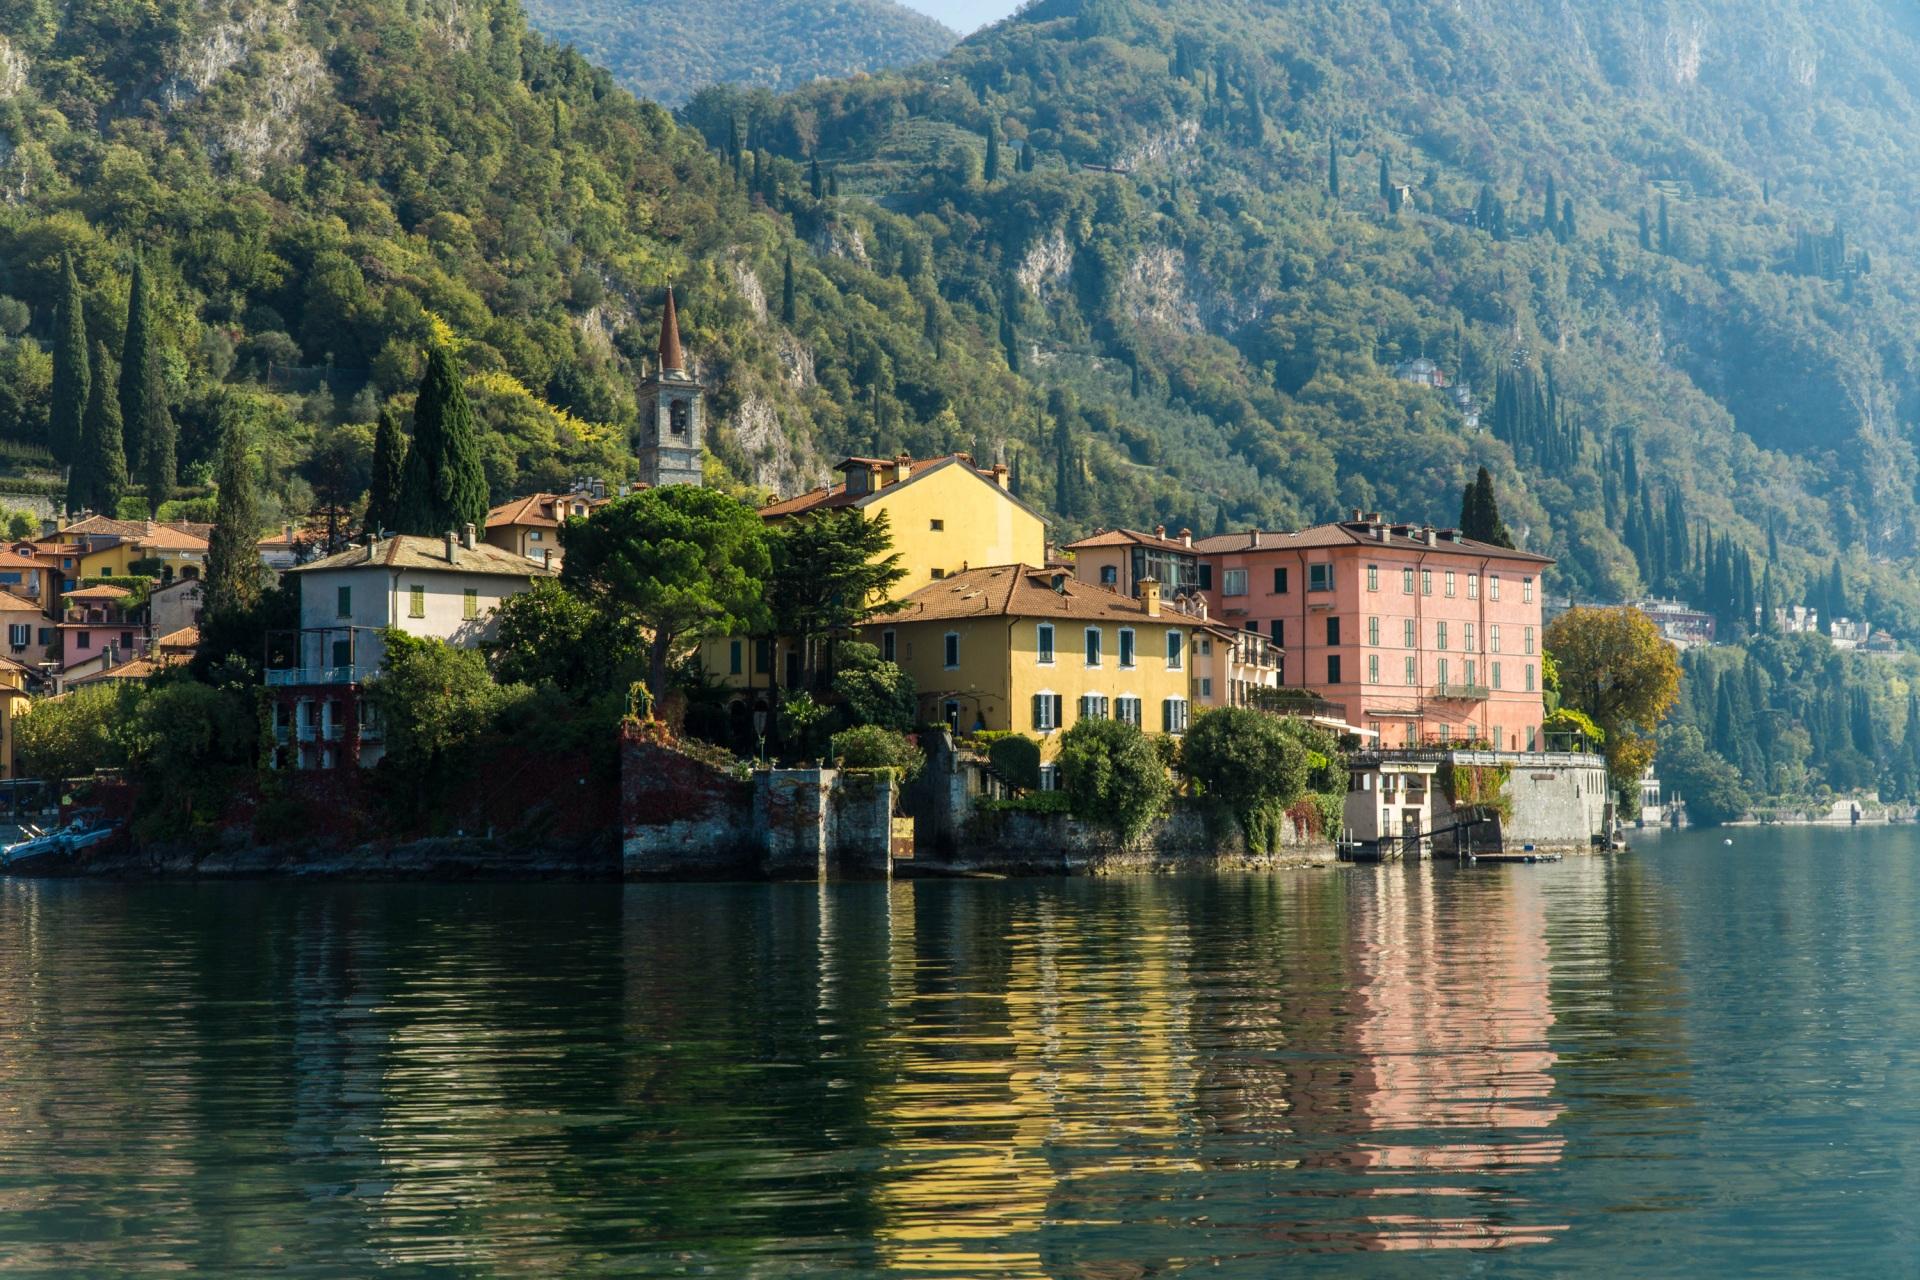 Картинка Италия Varenna Lake Como Озеро Дома Города 1920x1280 город Здания